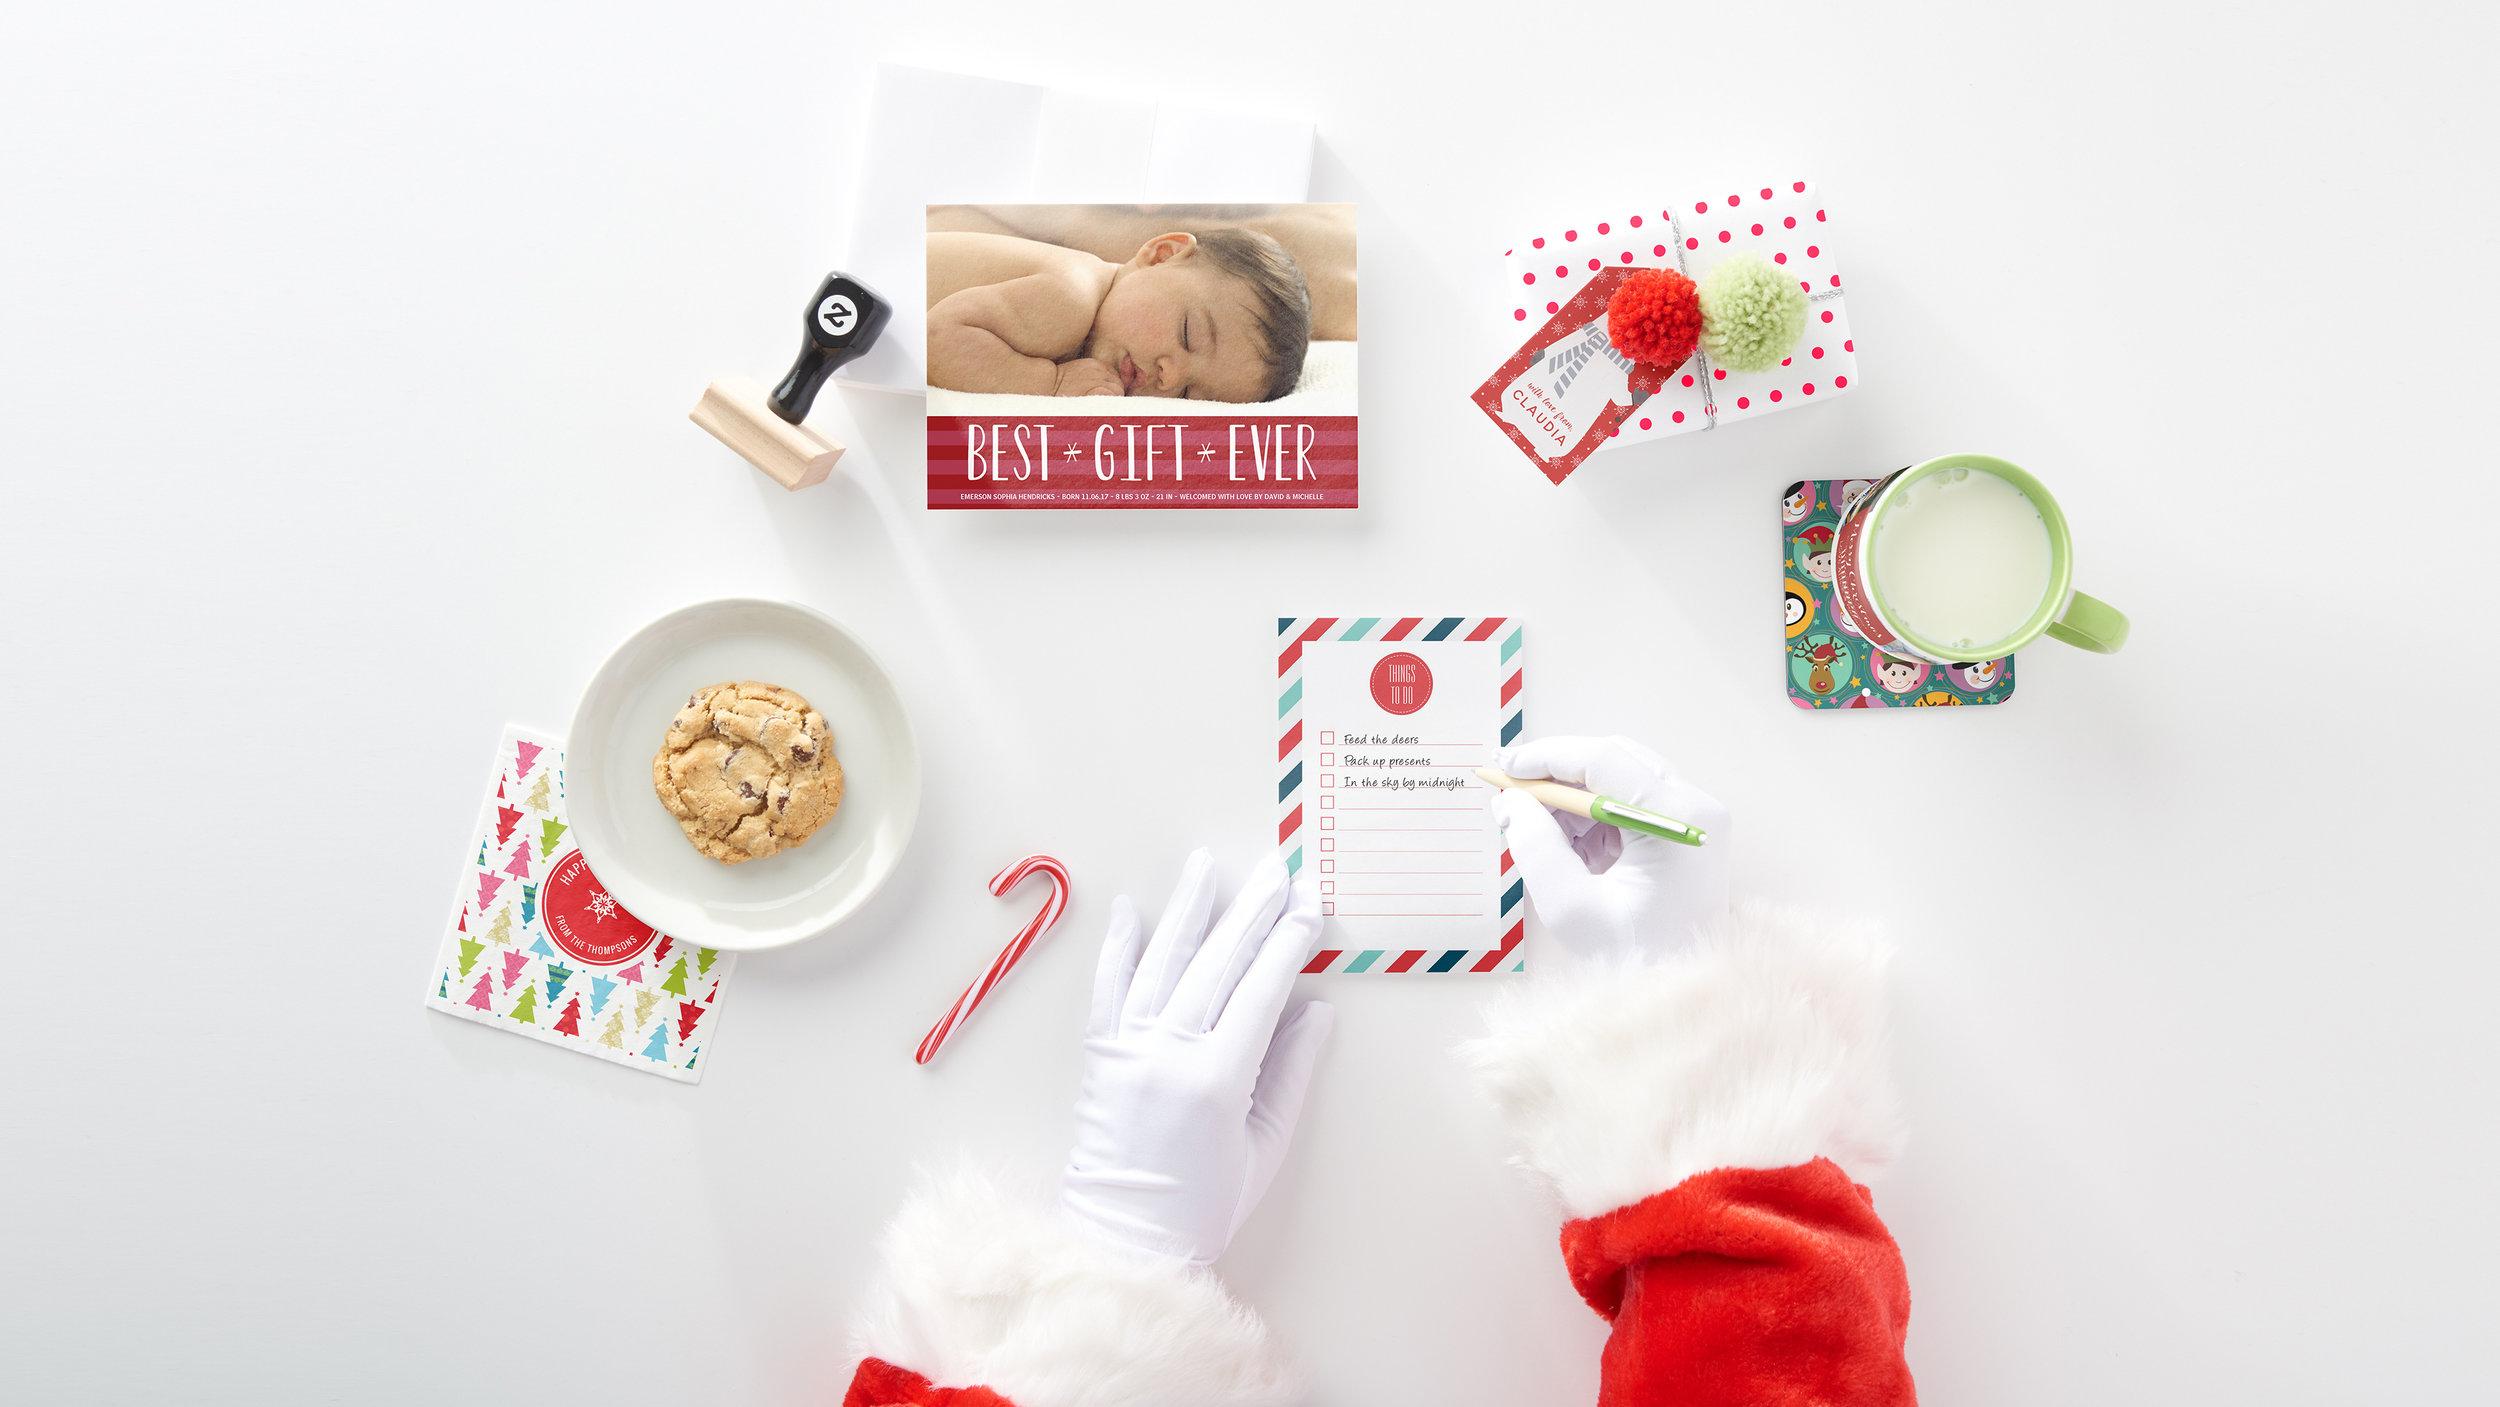 Santa_Hands_Holidays_2017_Screen_Saver_2018.jpg